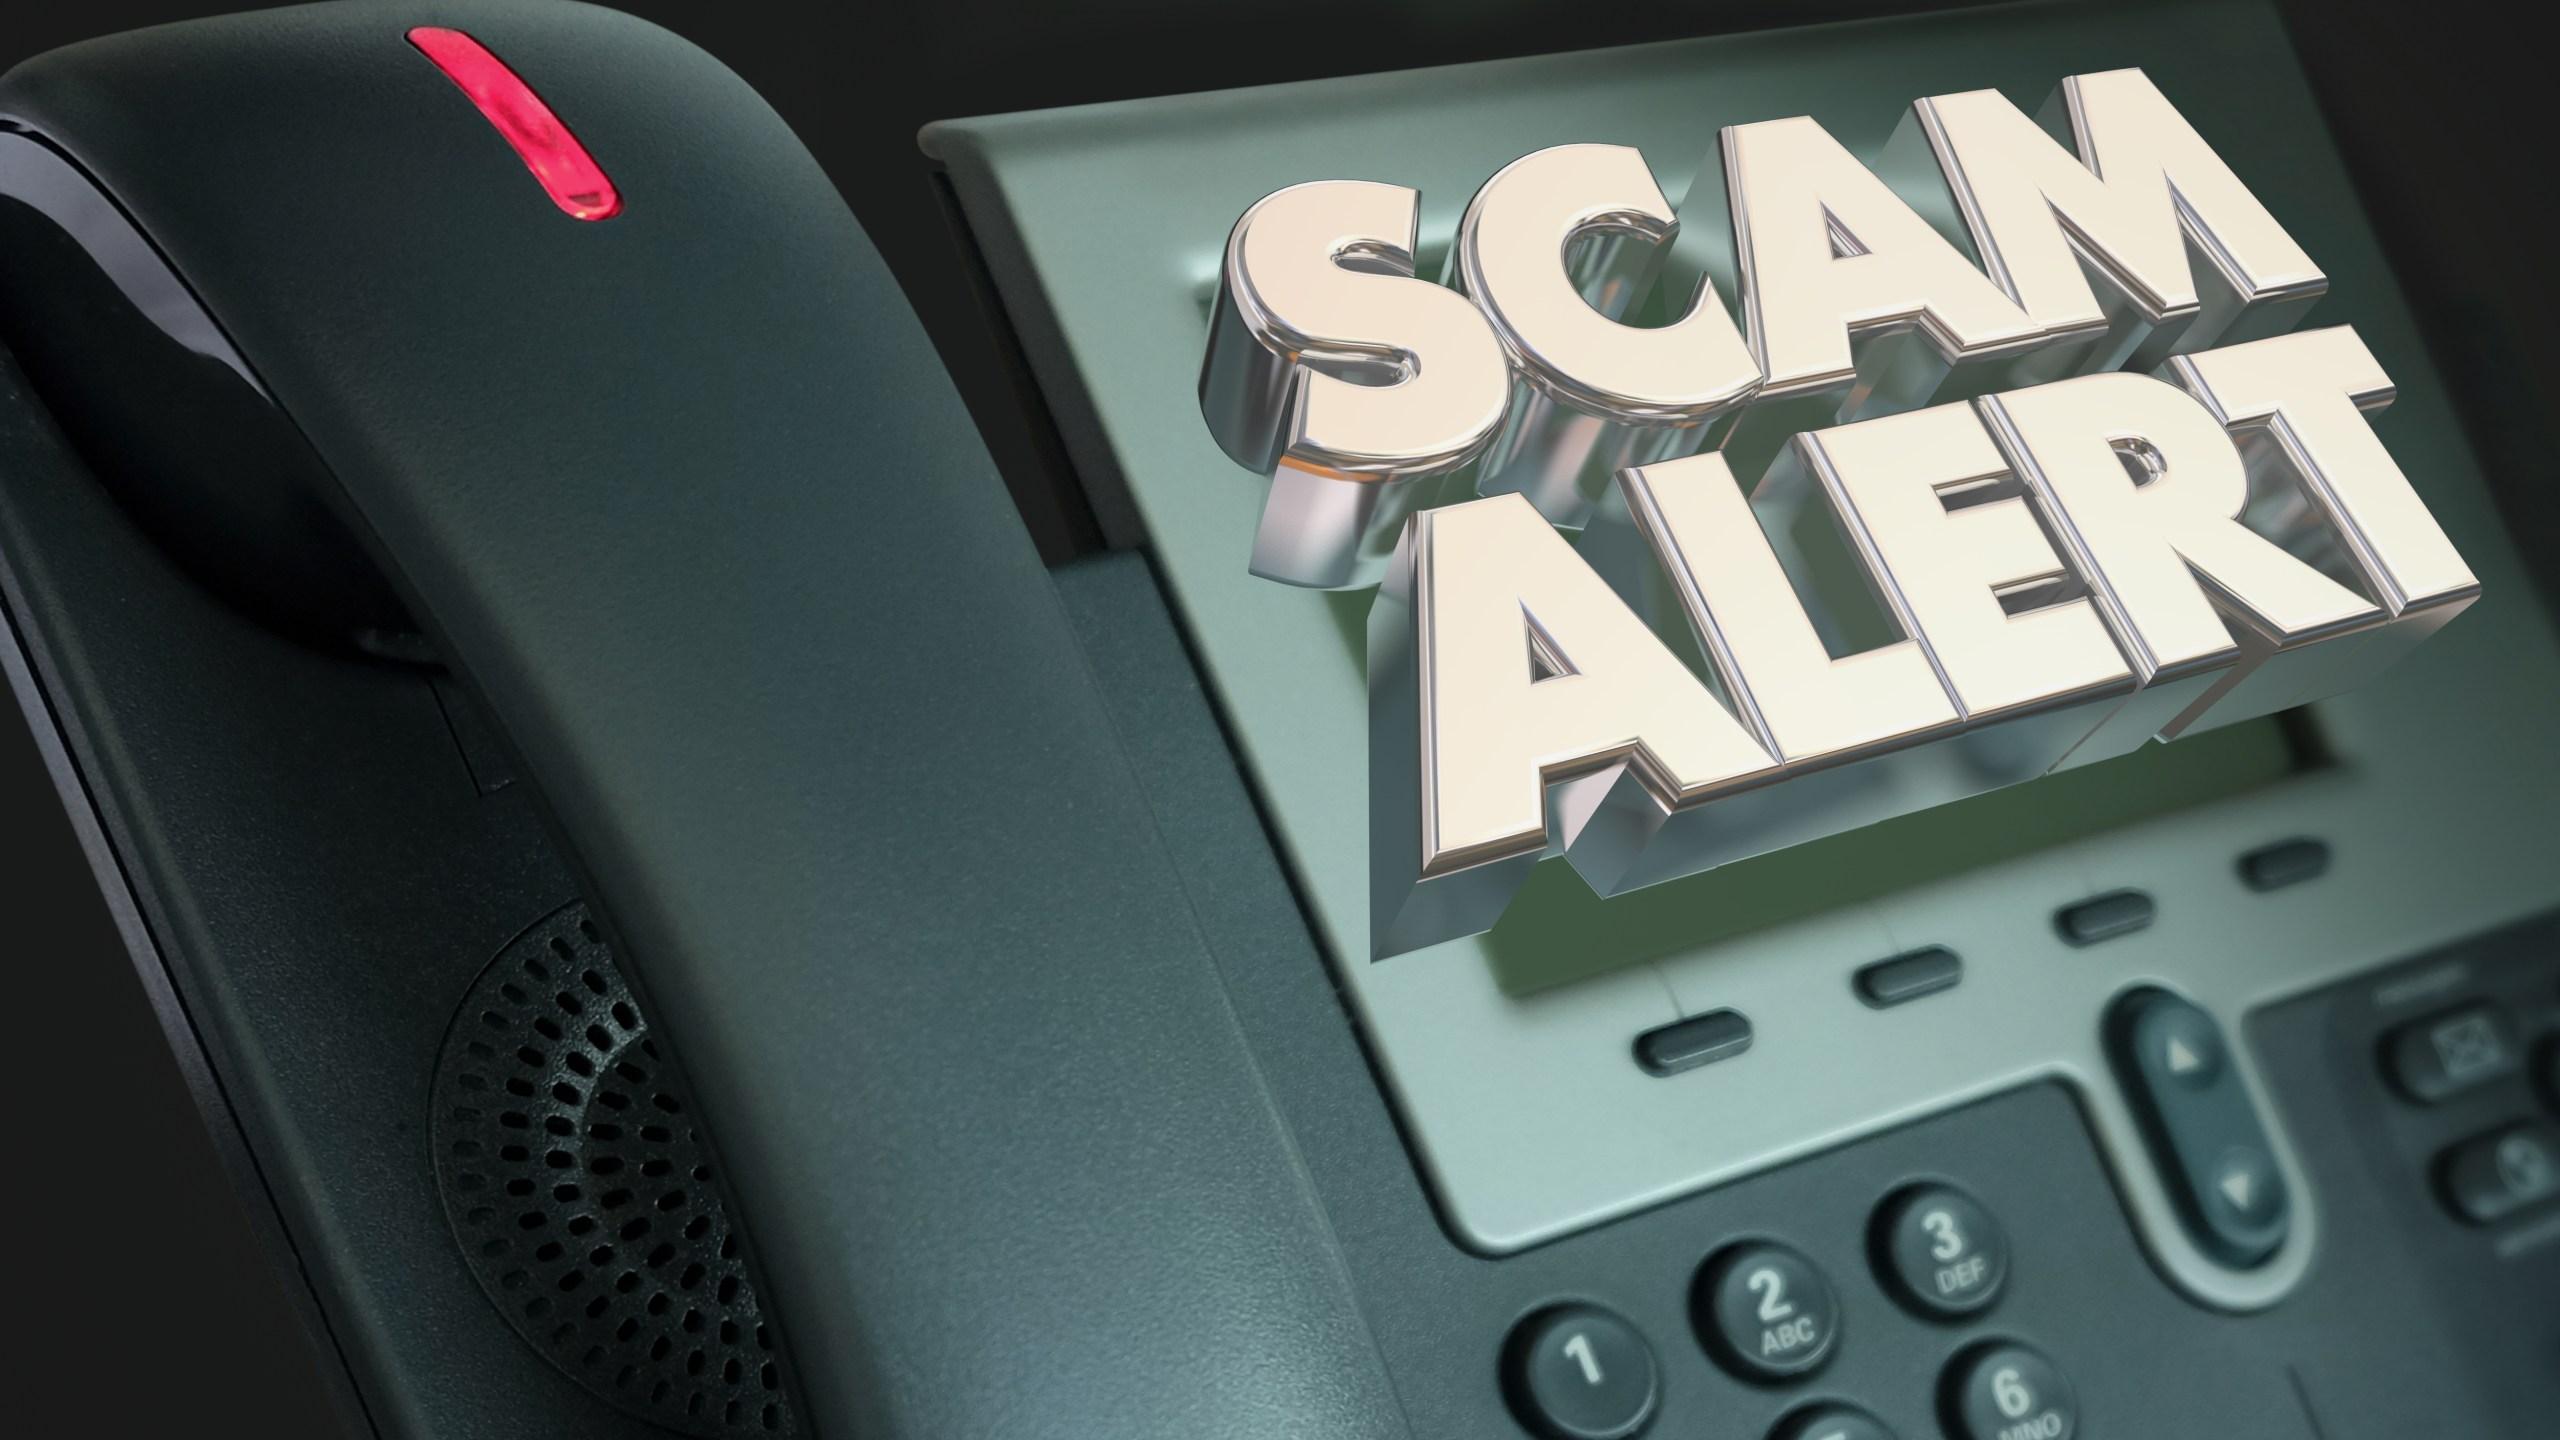 Scam Alert Telephone Fraud Crime 3d Illustration_1557330111225